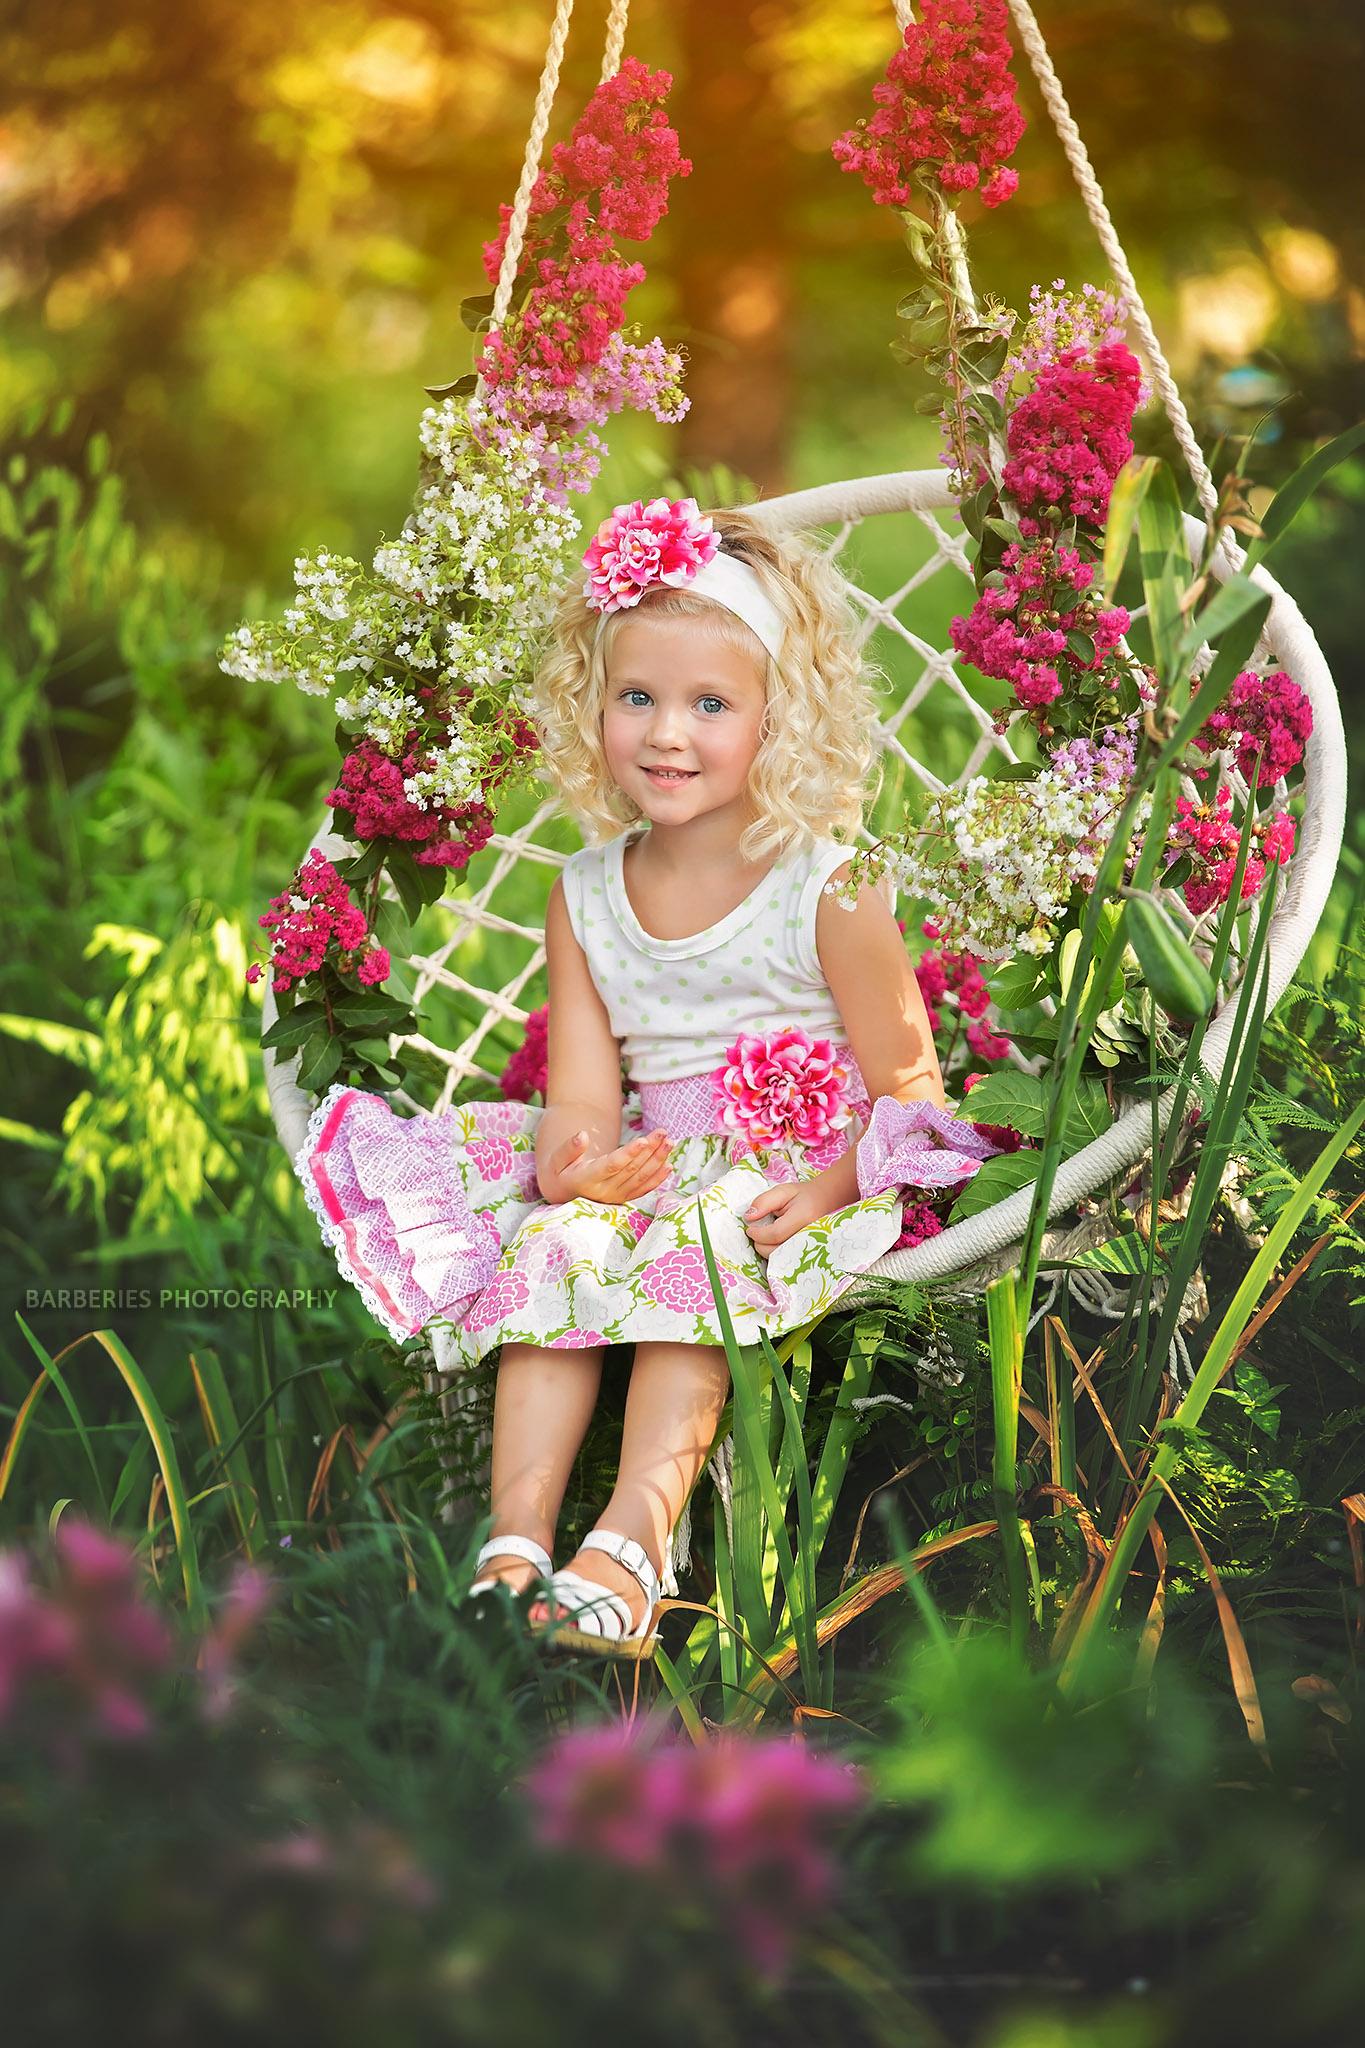 HOUSTON-CHILD-PHOTOGRAPHER-BARBERRIES-PHOTOGRAPHY-MACRAME-SWING.jpg